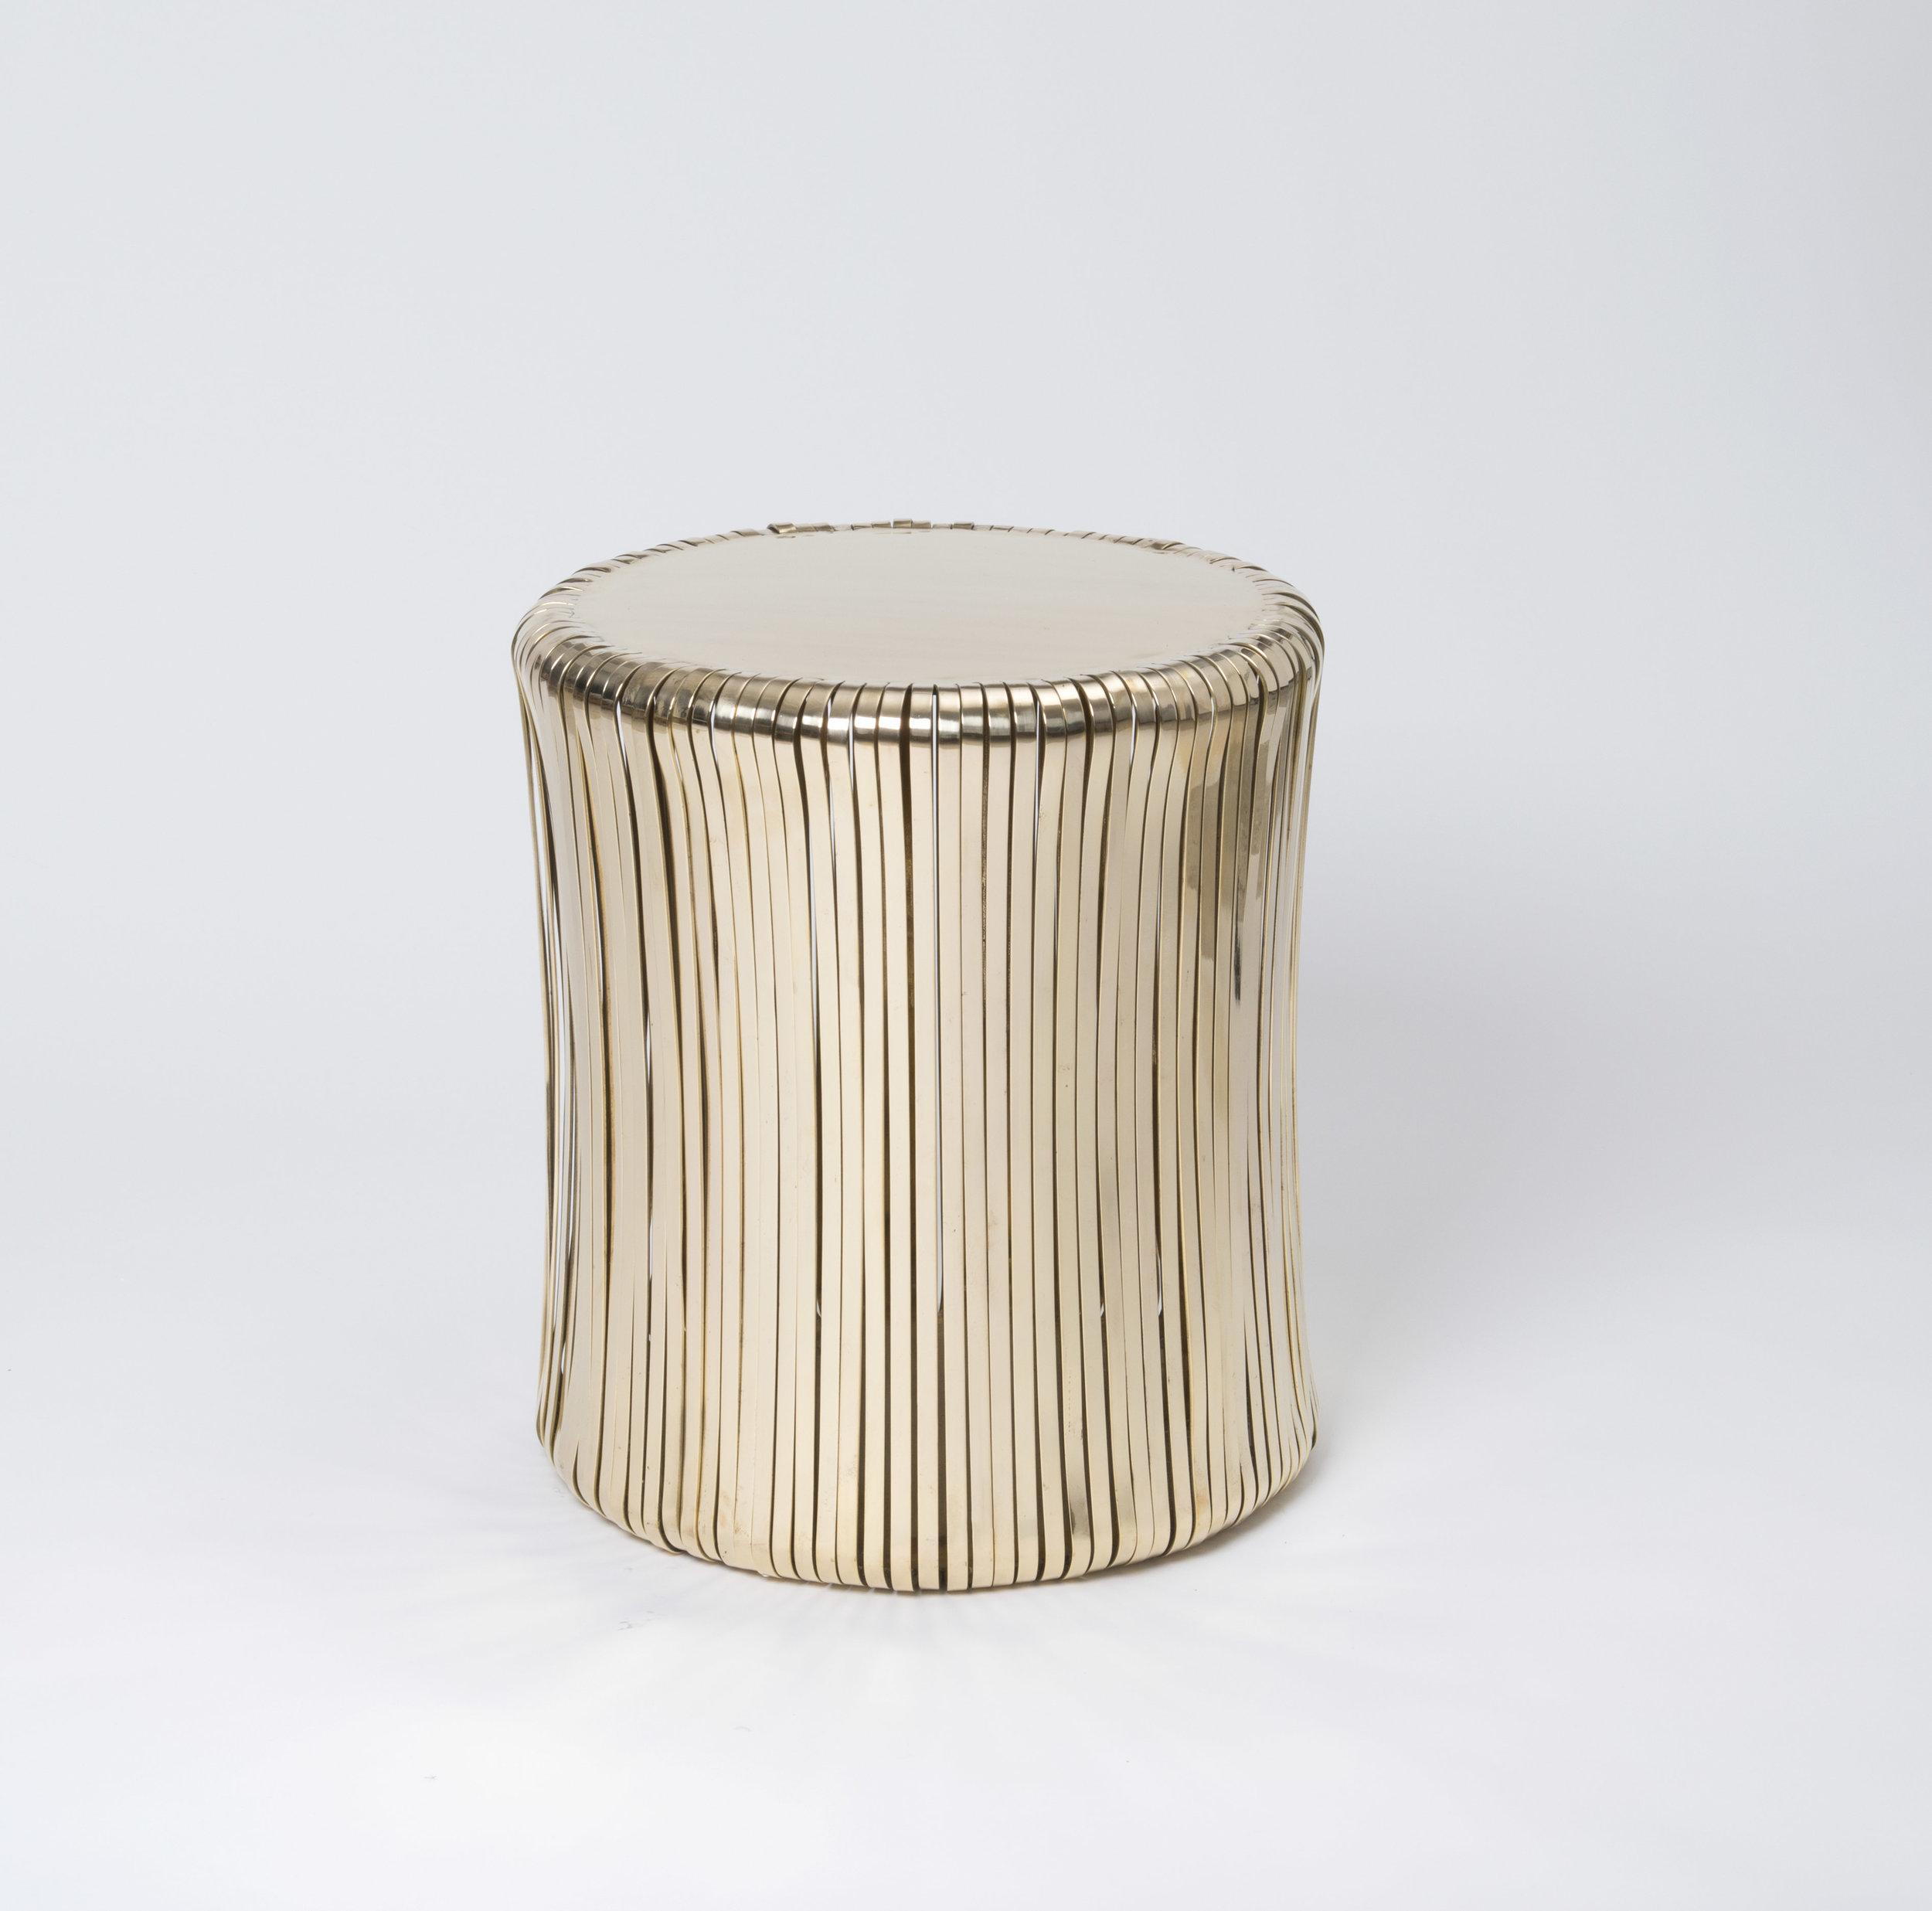 lana_table_front.jpg